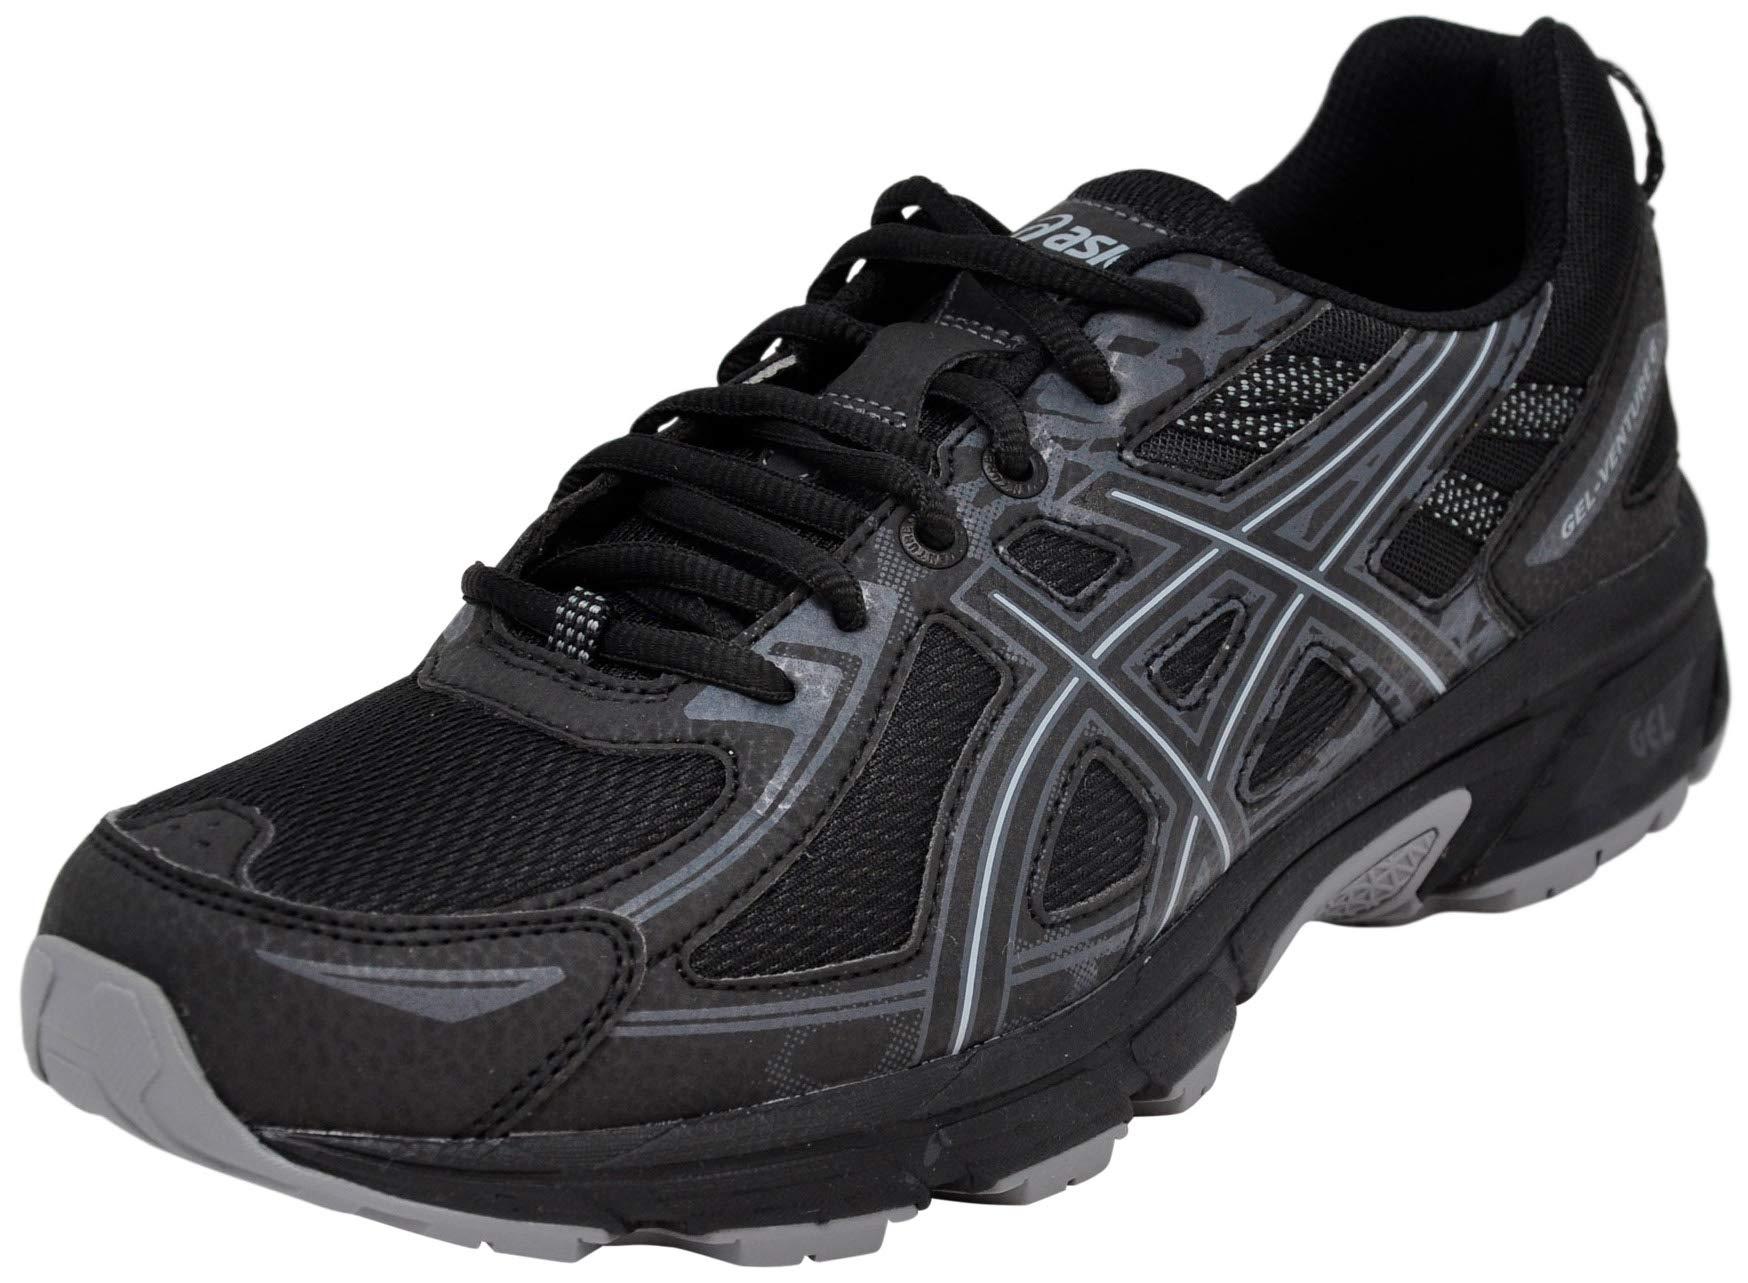 ASICS Men Gel-Venture 6 Running Shoe, Black/Black, 9 M US by ASICS